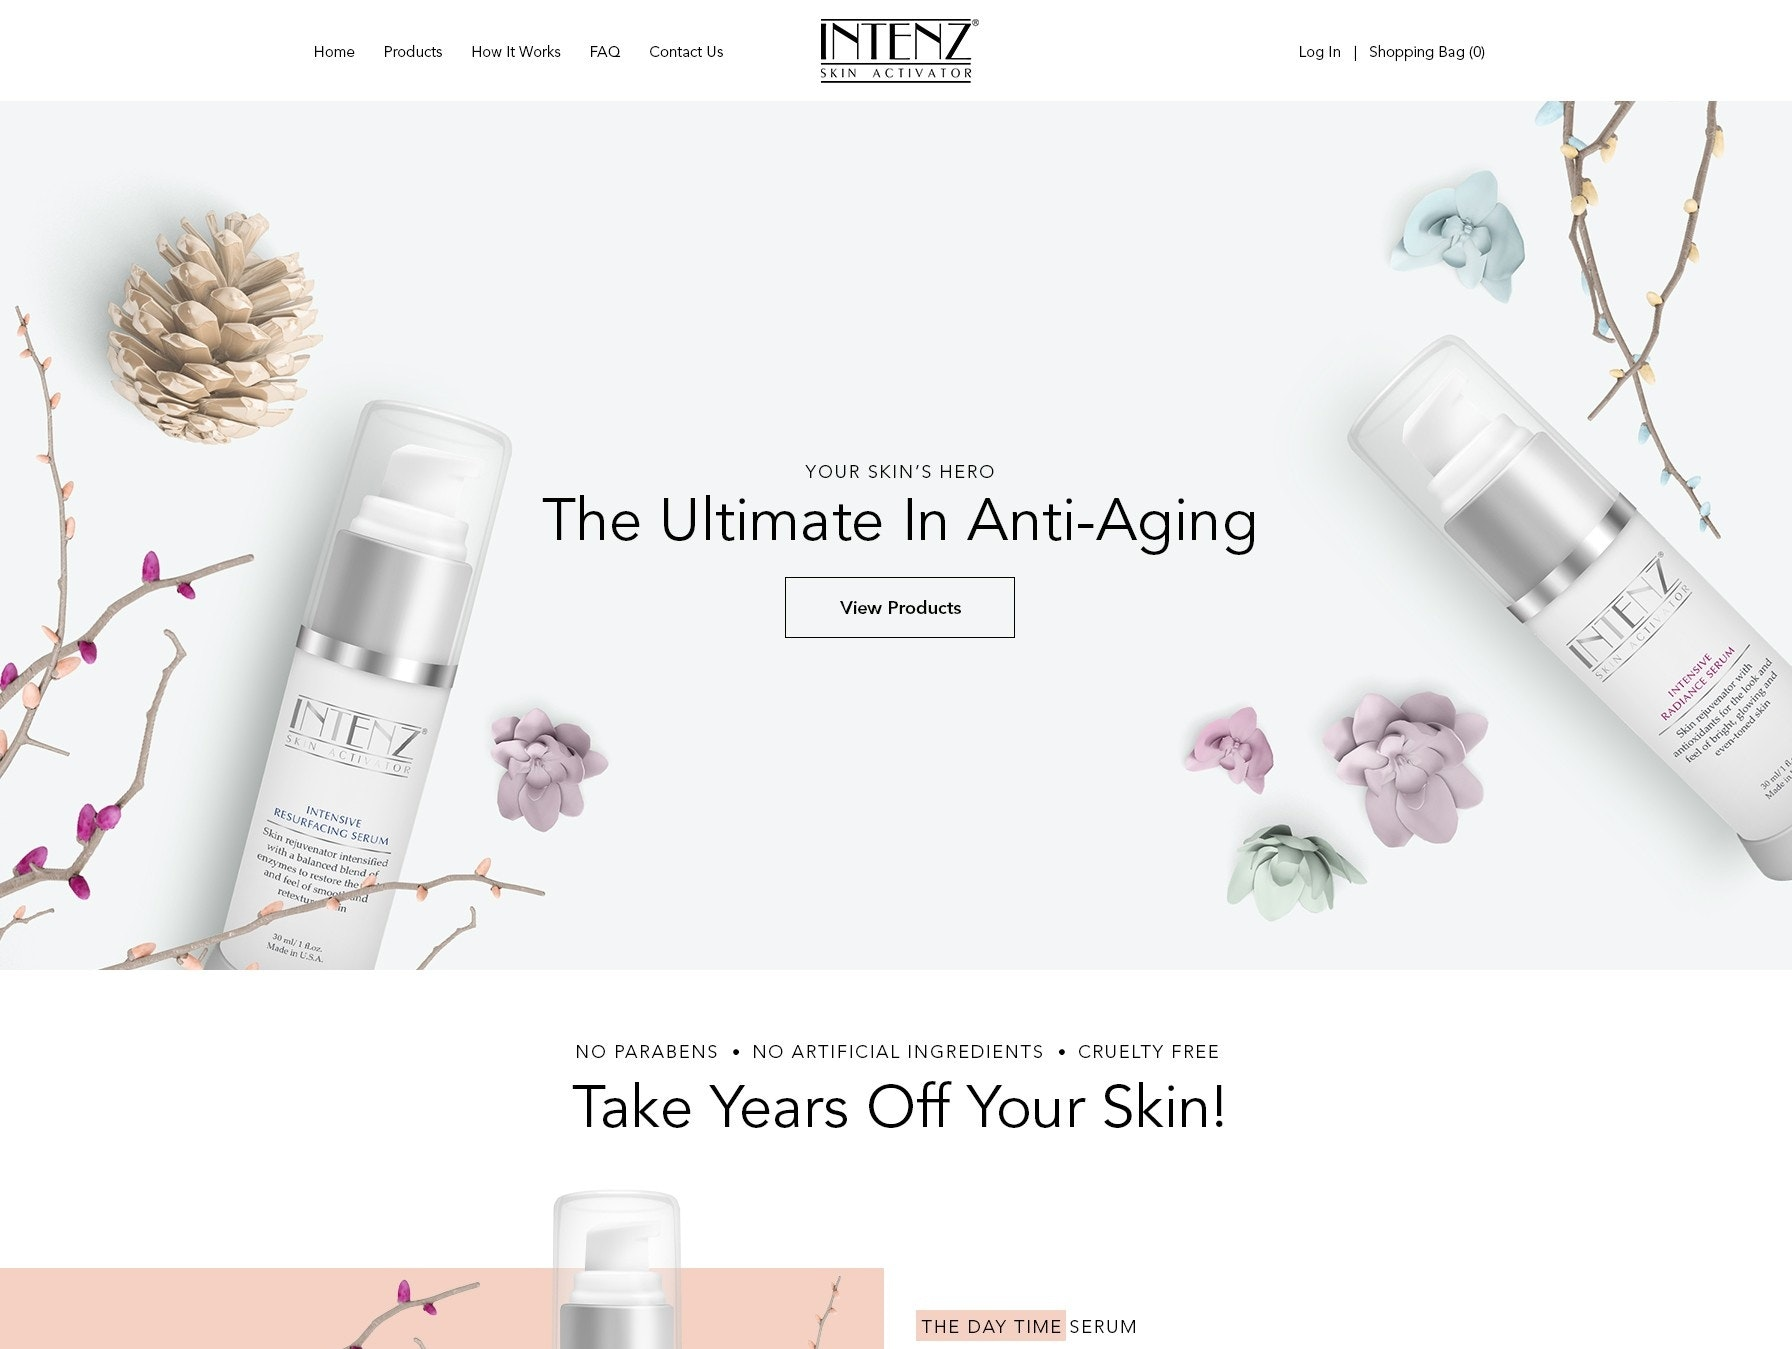 Intenz web page design